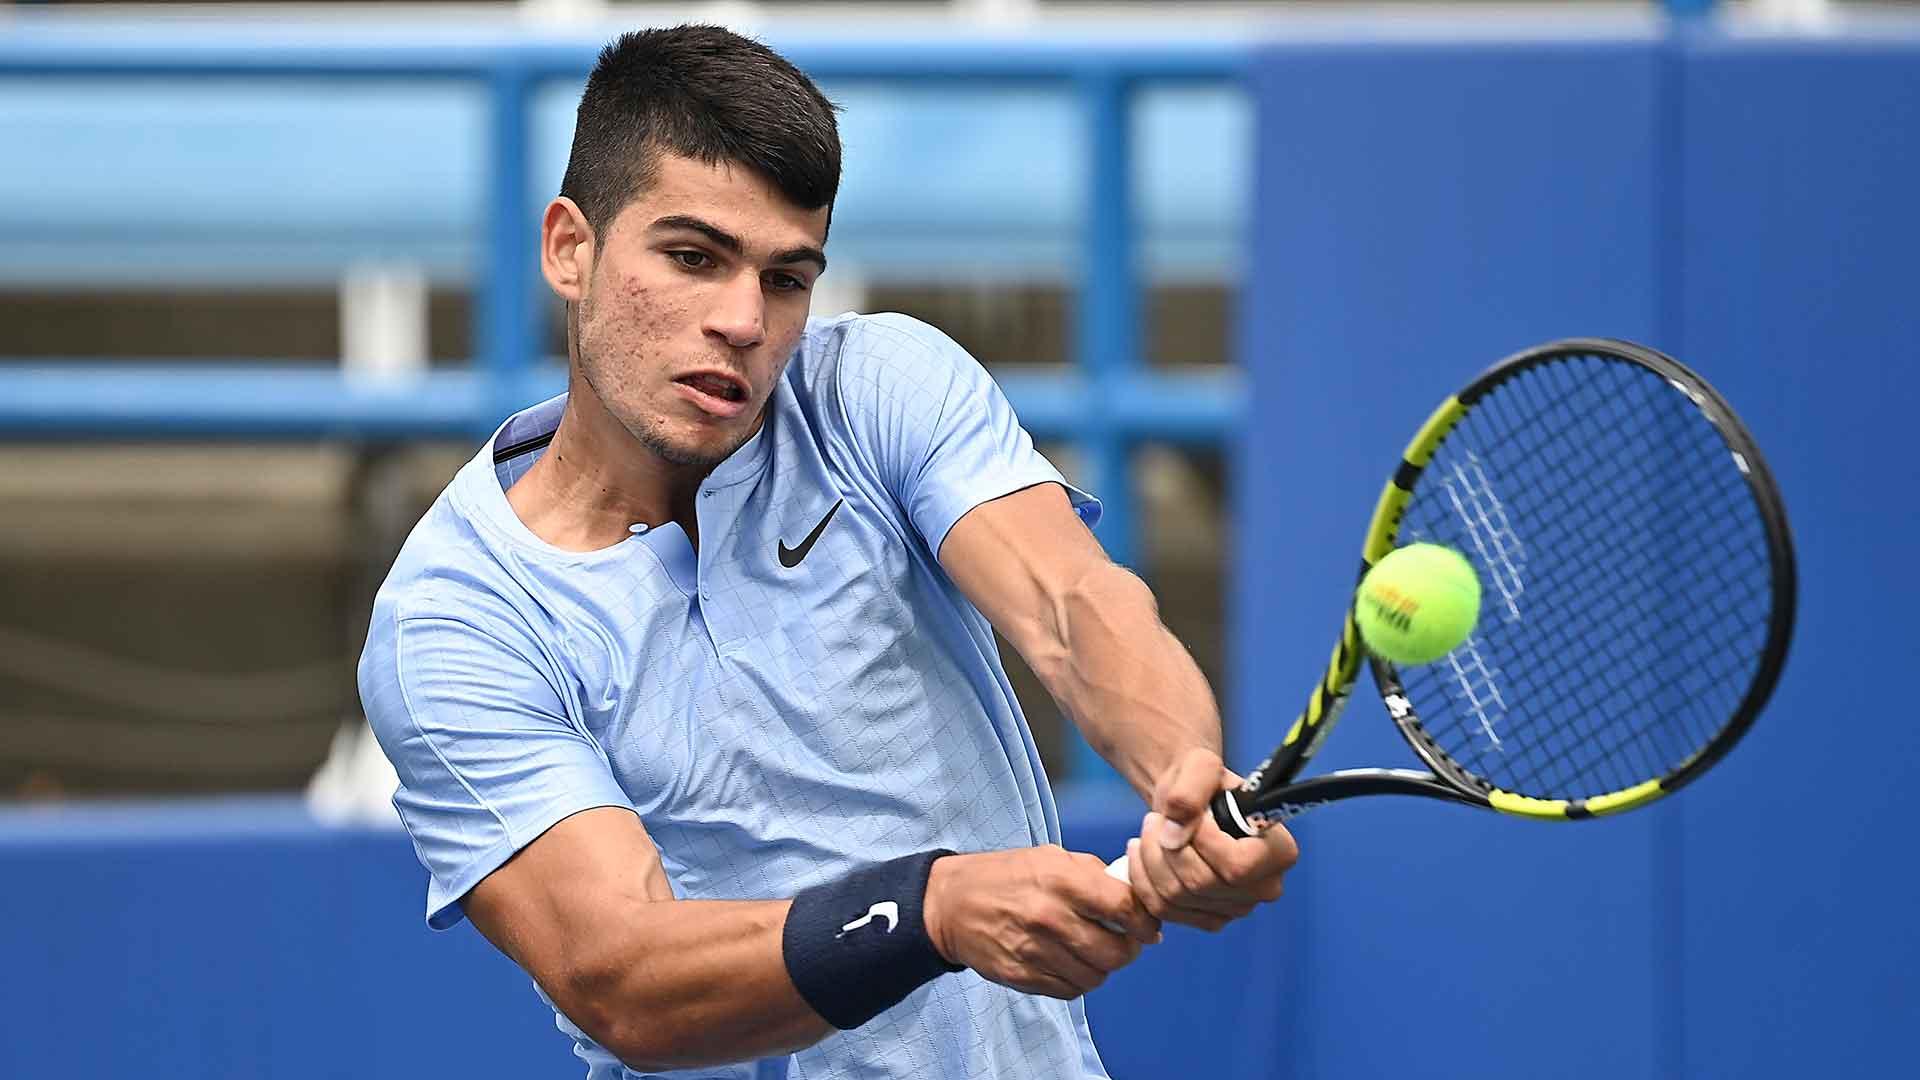 Winston-Salem Open 2021: Carlos Alcaraz vs Marton Fucsovics Tennis Pick and Prediction